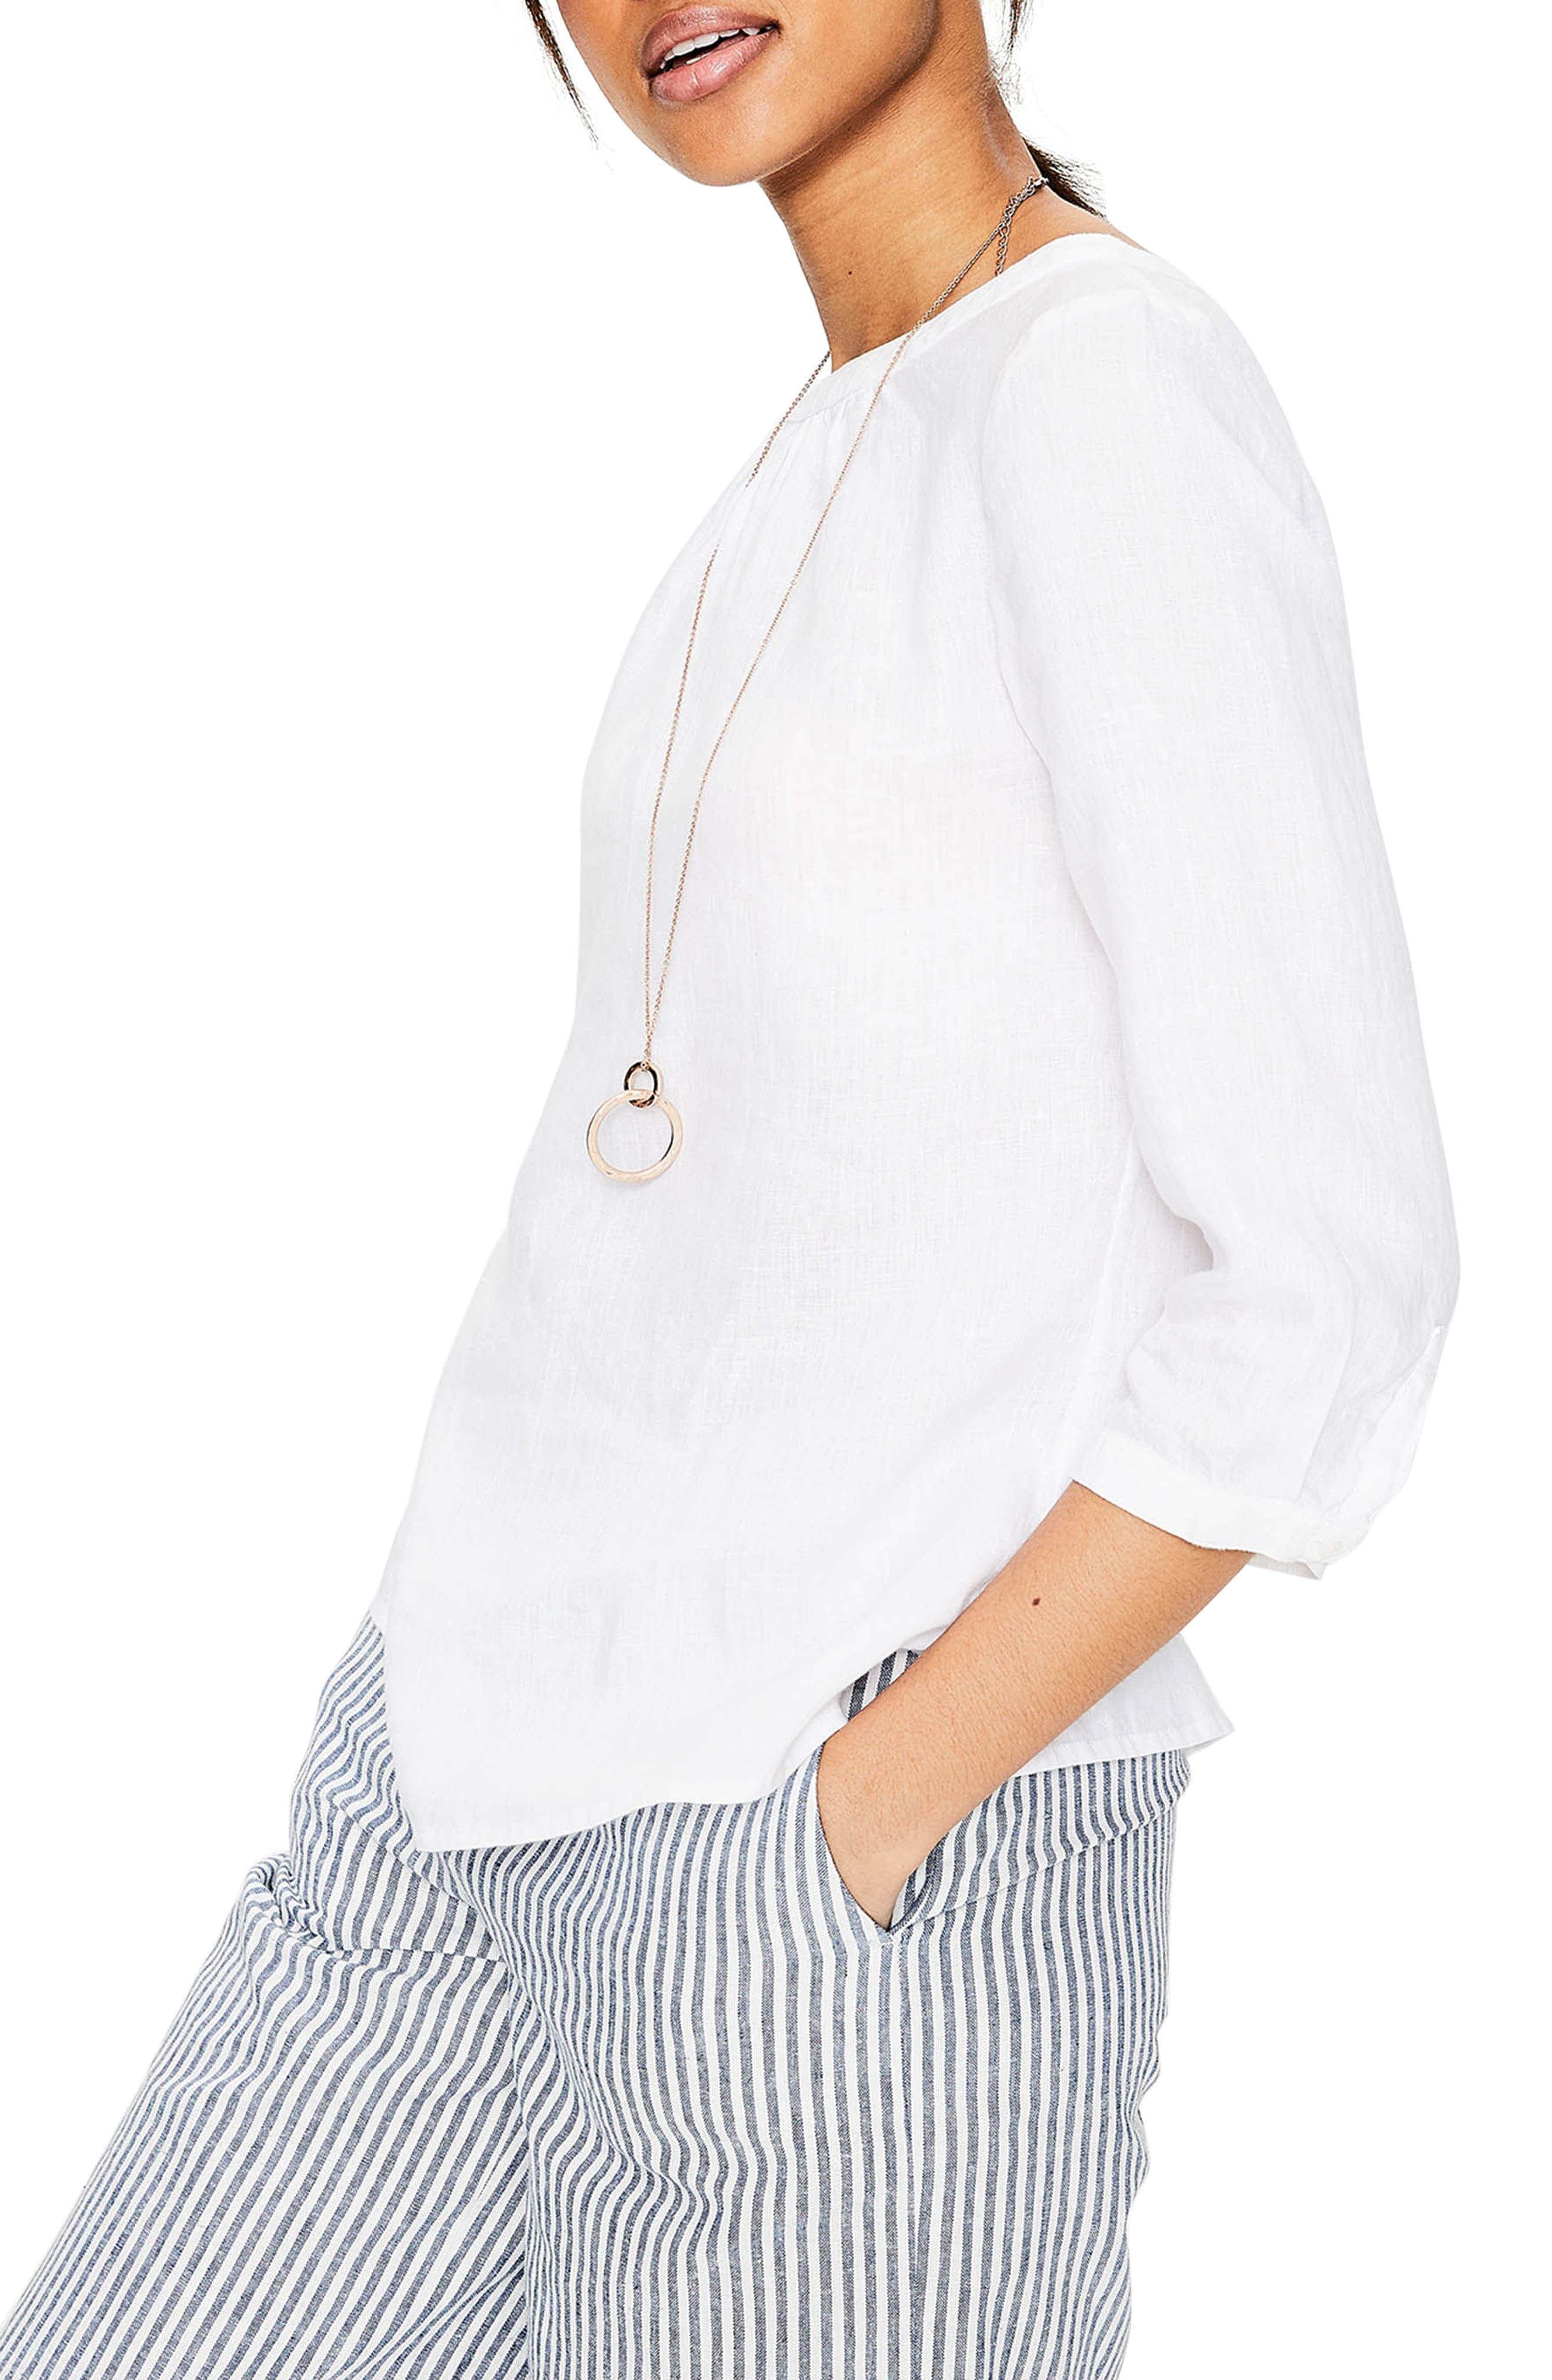 Katie Striped Linen Peasant Top,                             Alternate thumbnail 3, color,                             White